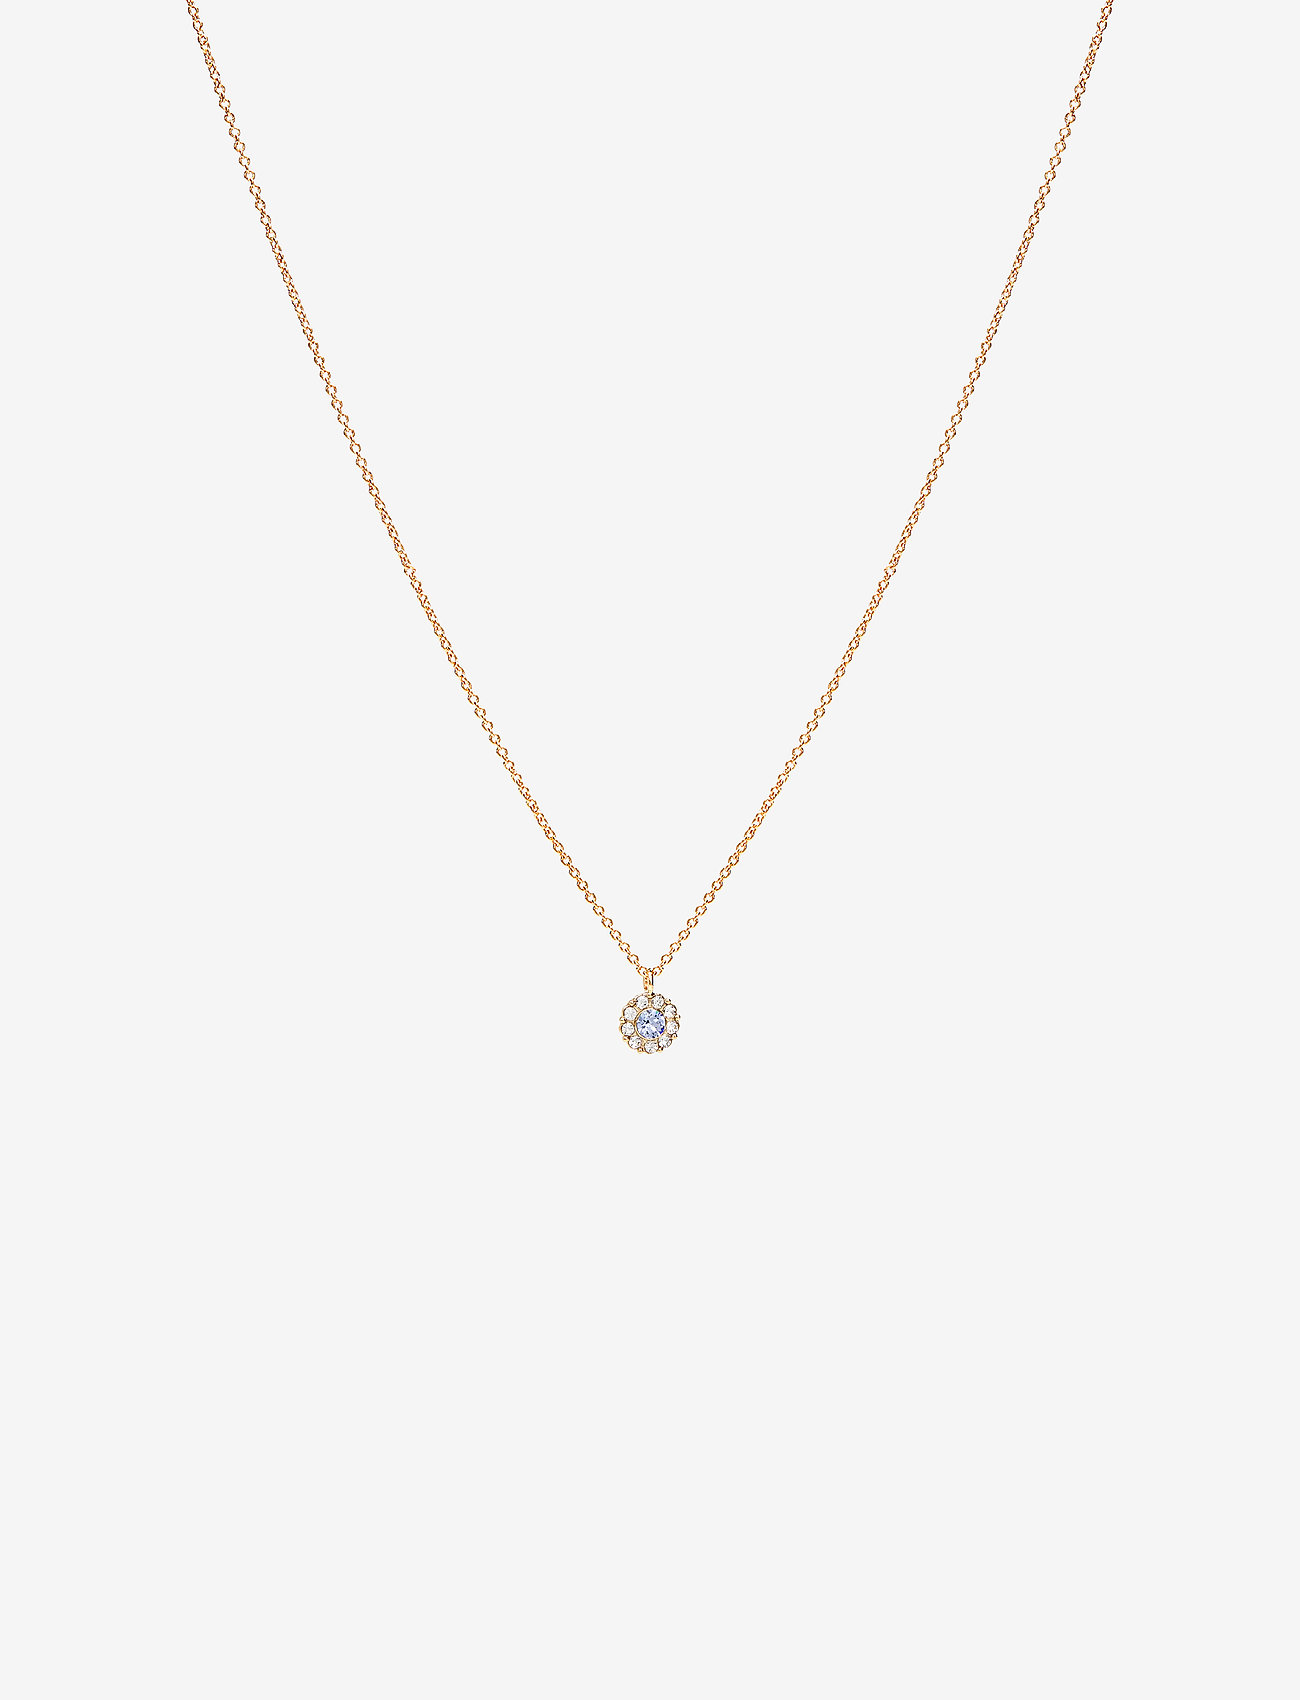 LILY AND ROSE - Petite Miss Sofia necklace - Light sapphire - sirot kaulakorut - light sapphire